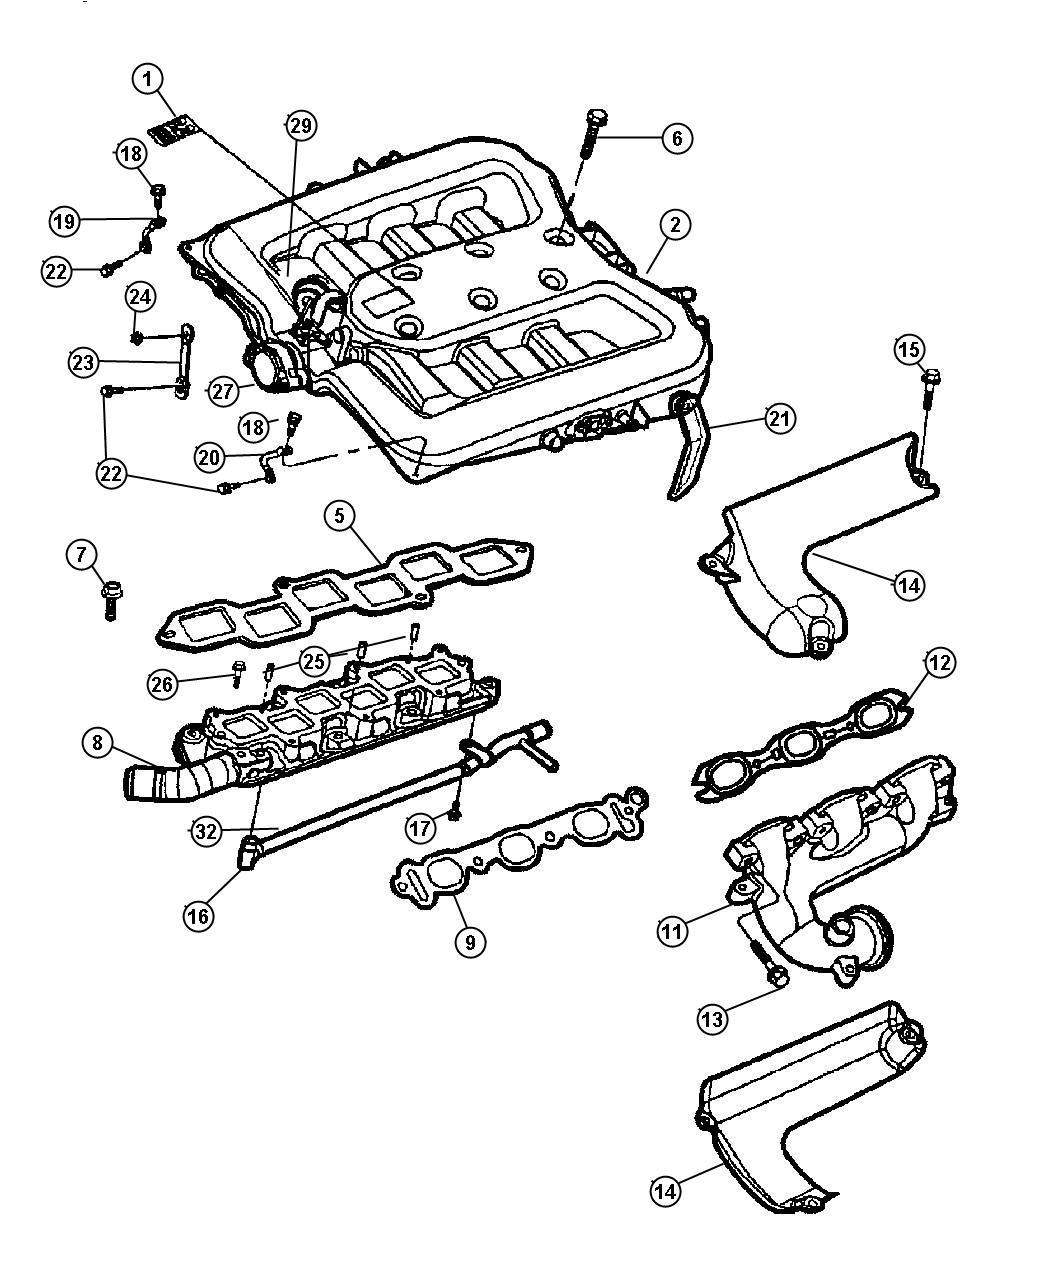 2001 Dodge Intrepid Shield Lower Left Exhaust Manifold